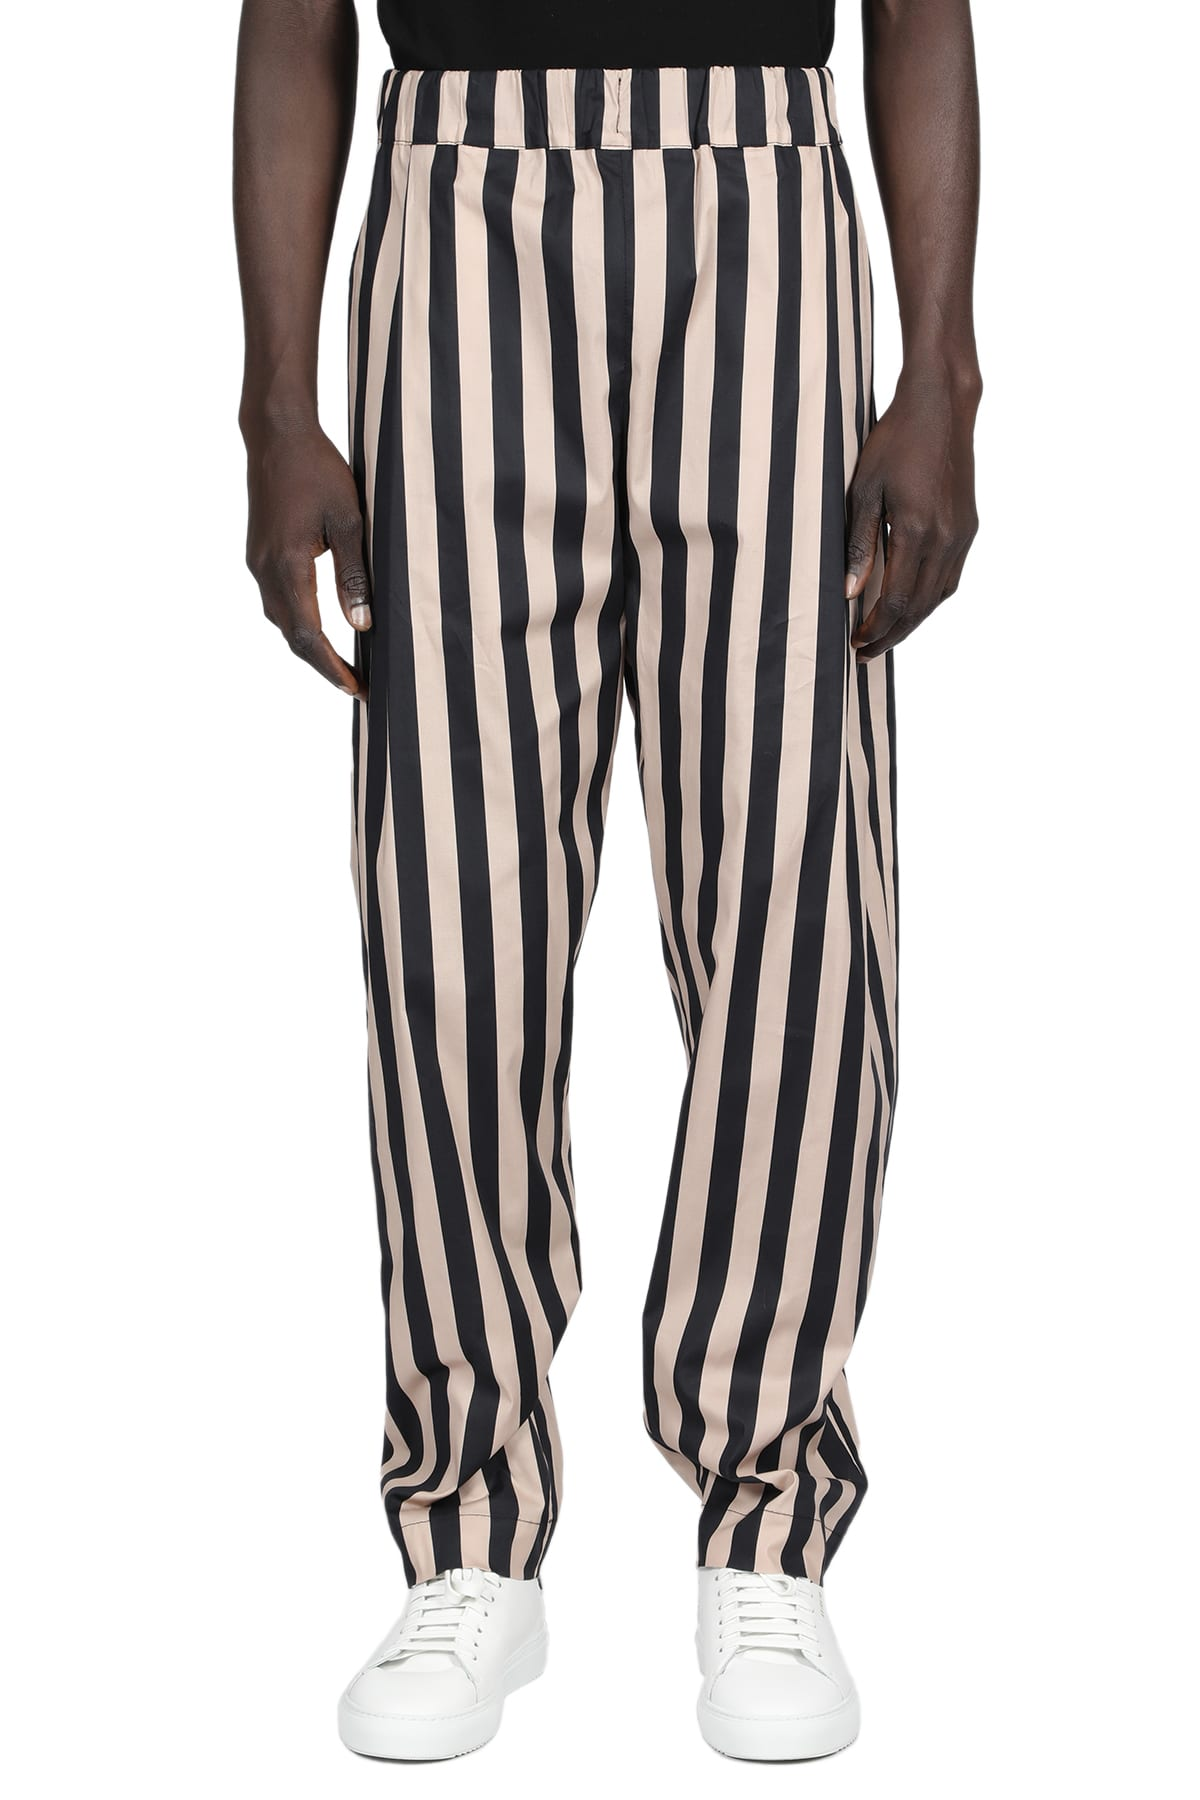 Laneus Straight pants STRIPED POPELINE PANT